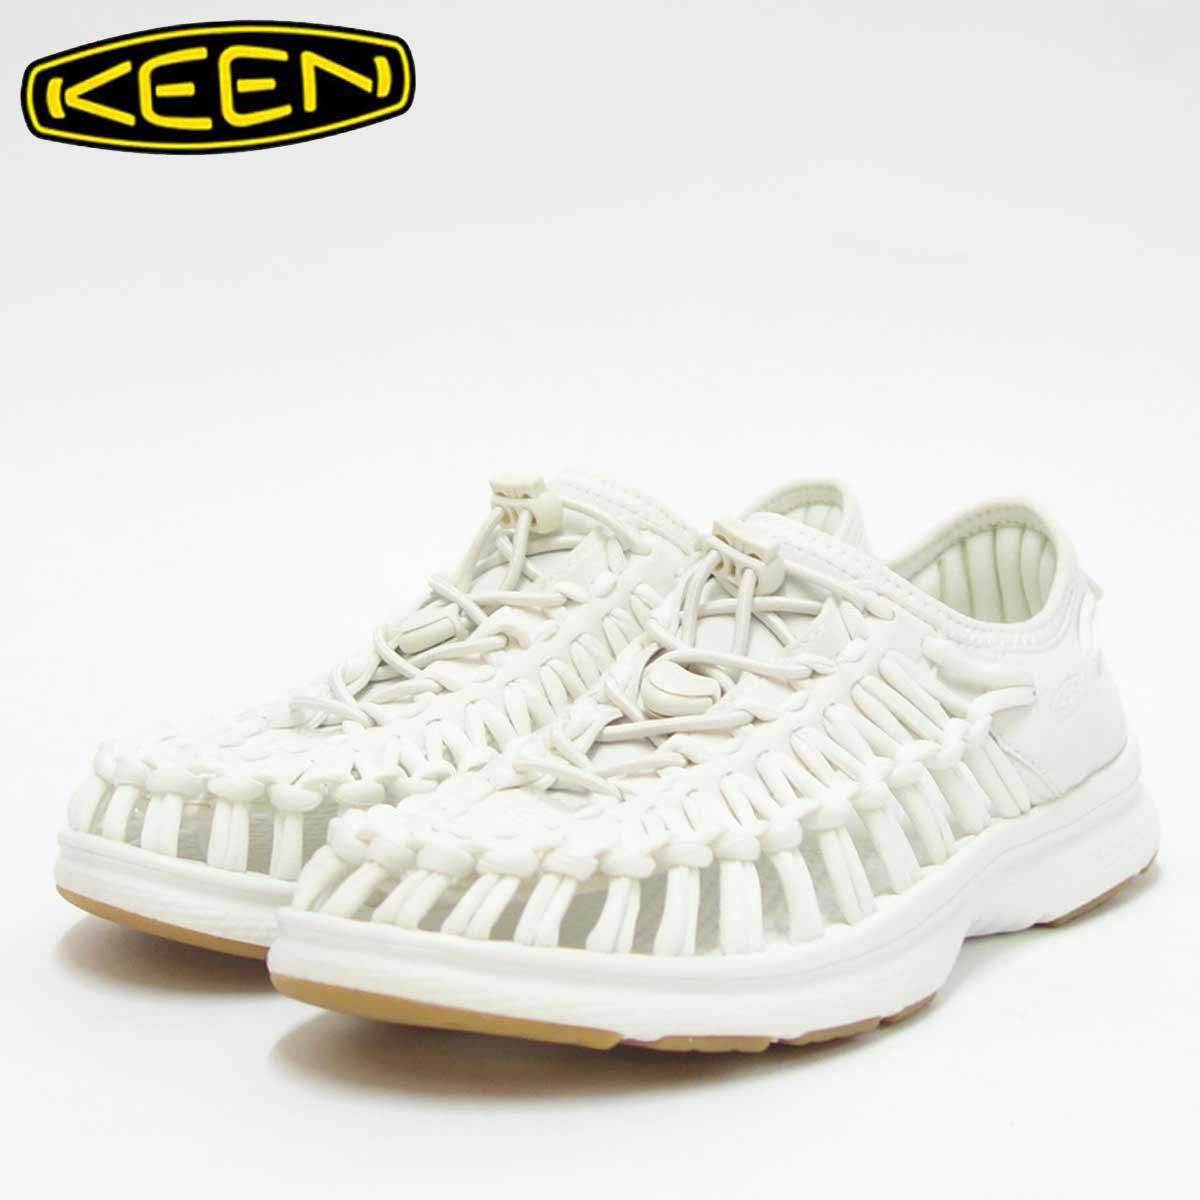 KEEN キーン UNEEK O2(ユニーク オーツー) 1017059(レディース)キーン独自のオープンエアースニーカー カラー:White/Harvest Gold「靴」